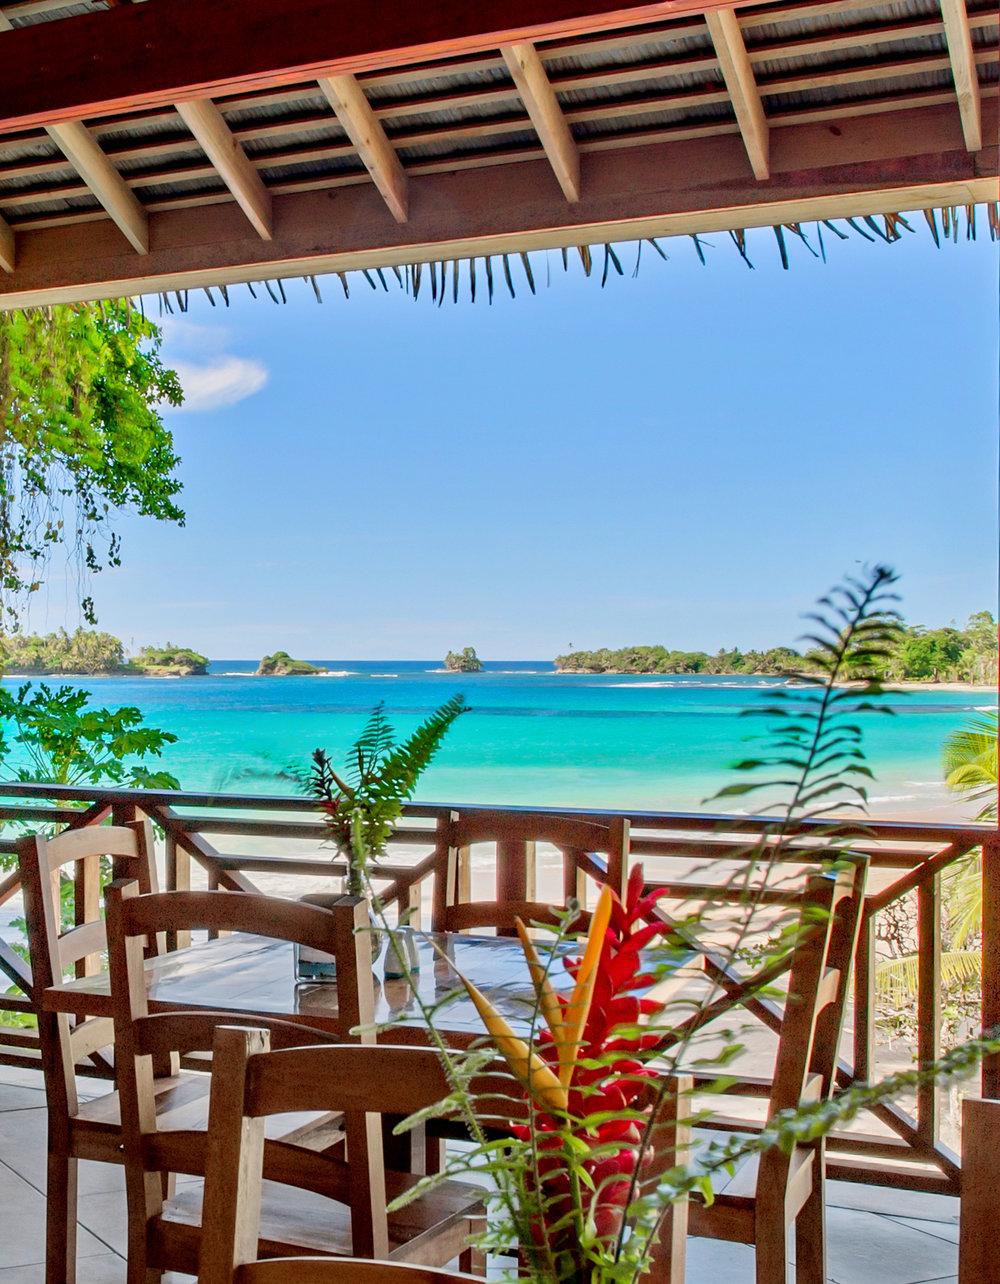 Beach_Club_Restaurant (resized).jpg